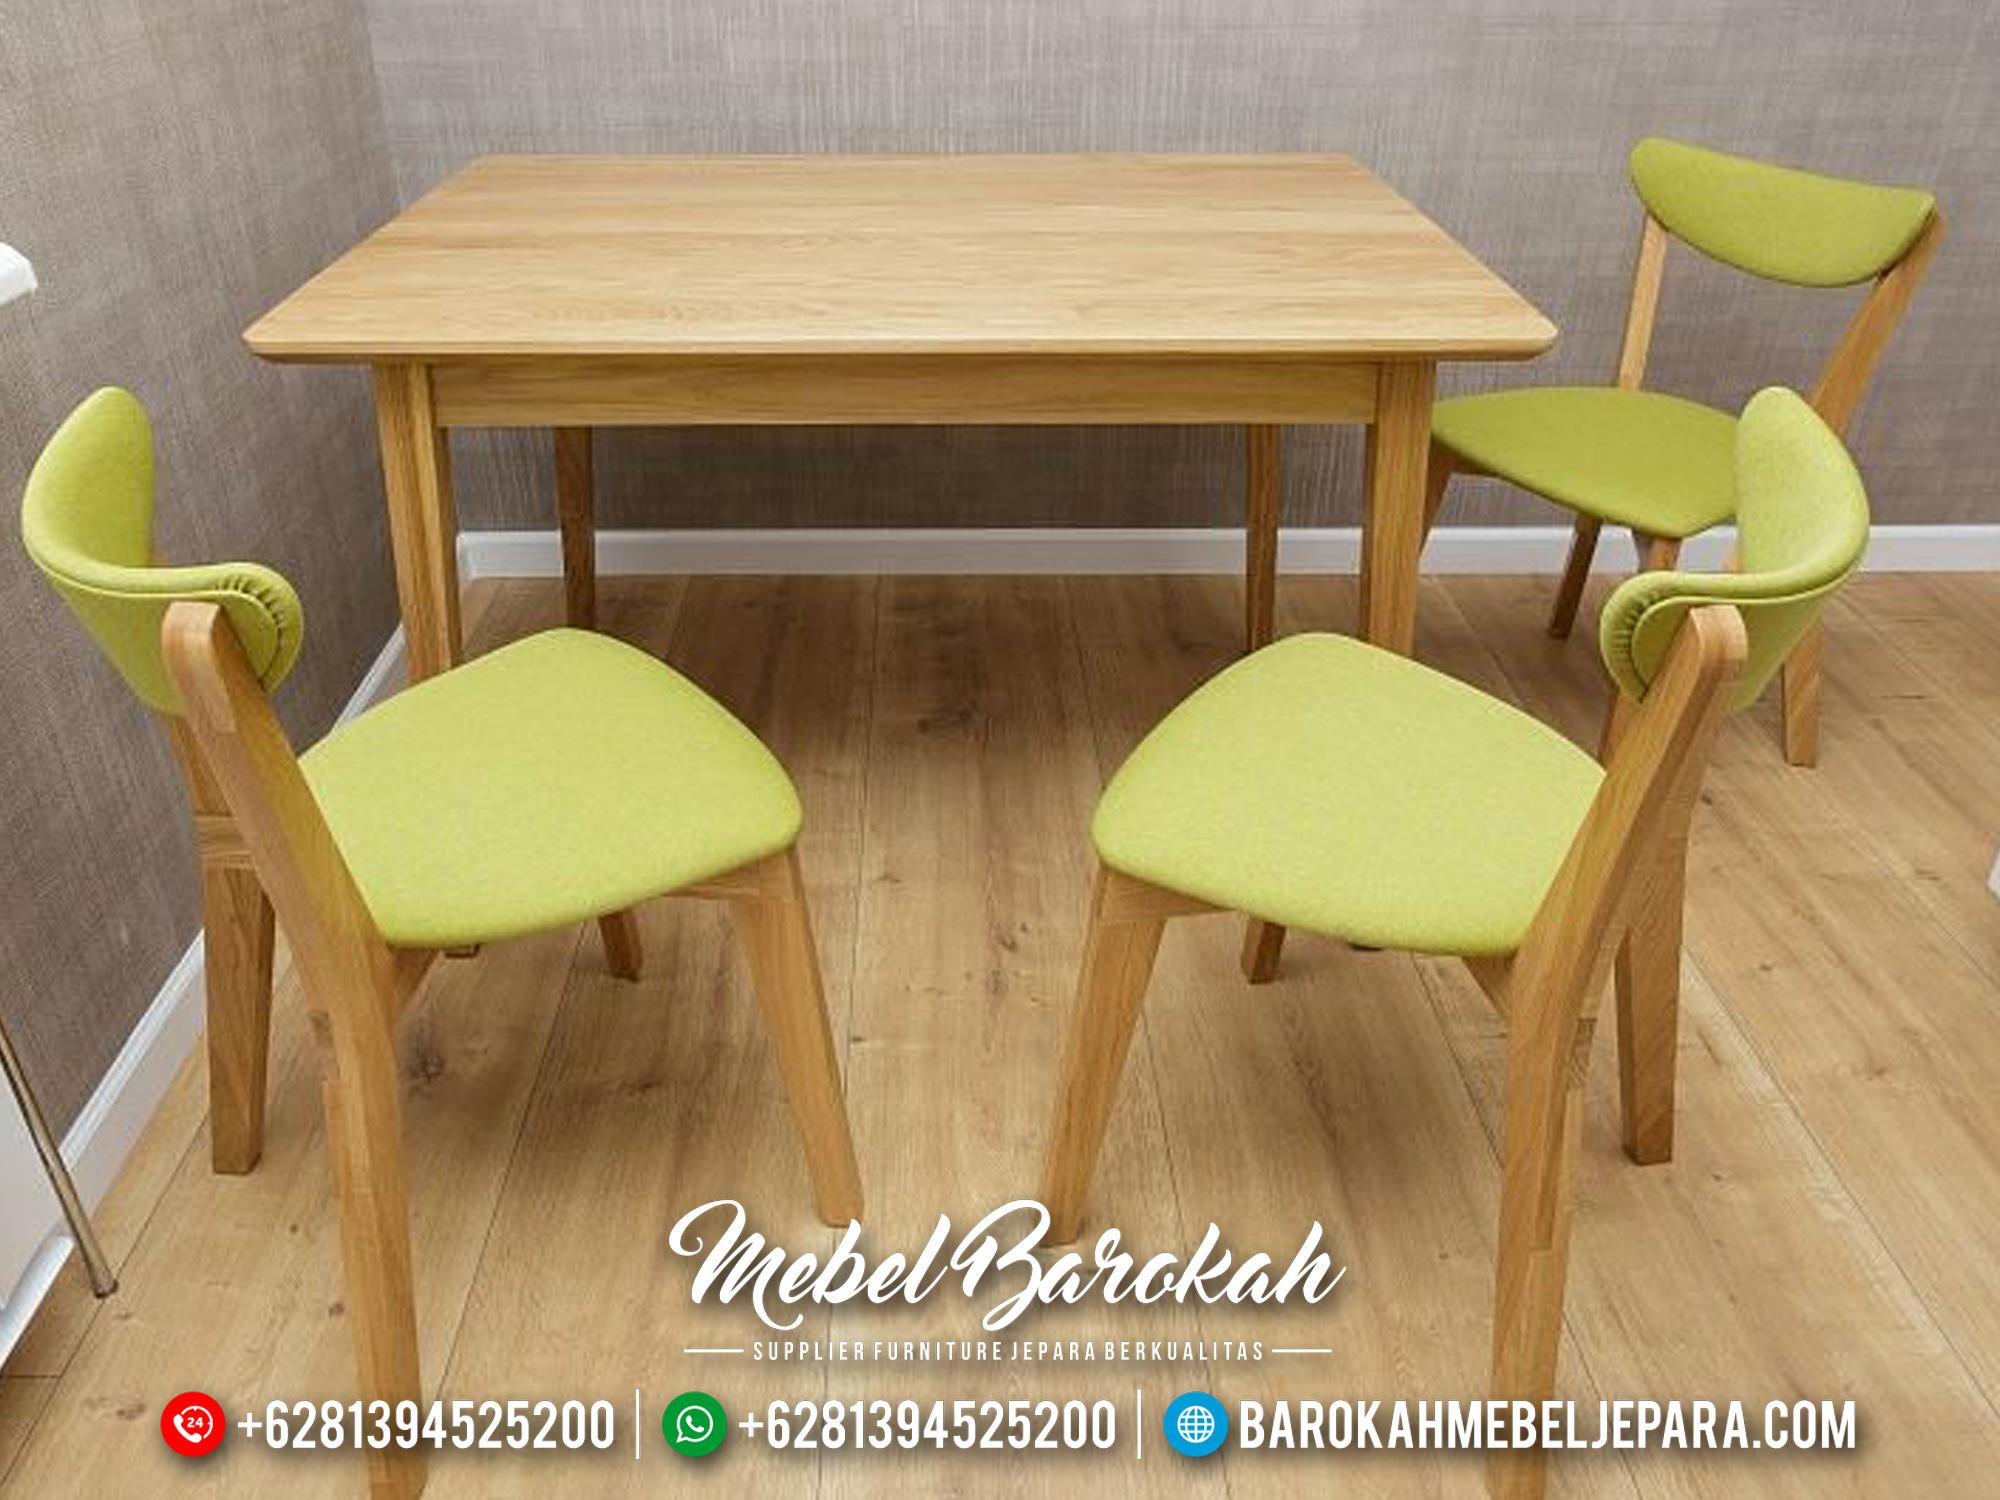 Meja Kursi Cafe, Kursi Cafe Terbaru, Kursi Cafe Minimalis, Set Kursi Cafe, Kursi Cafe Antik, Desain Kursi Cafe, Kursi Cafe Retro